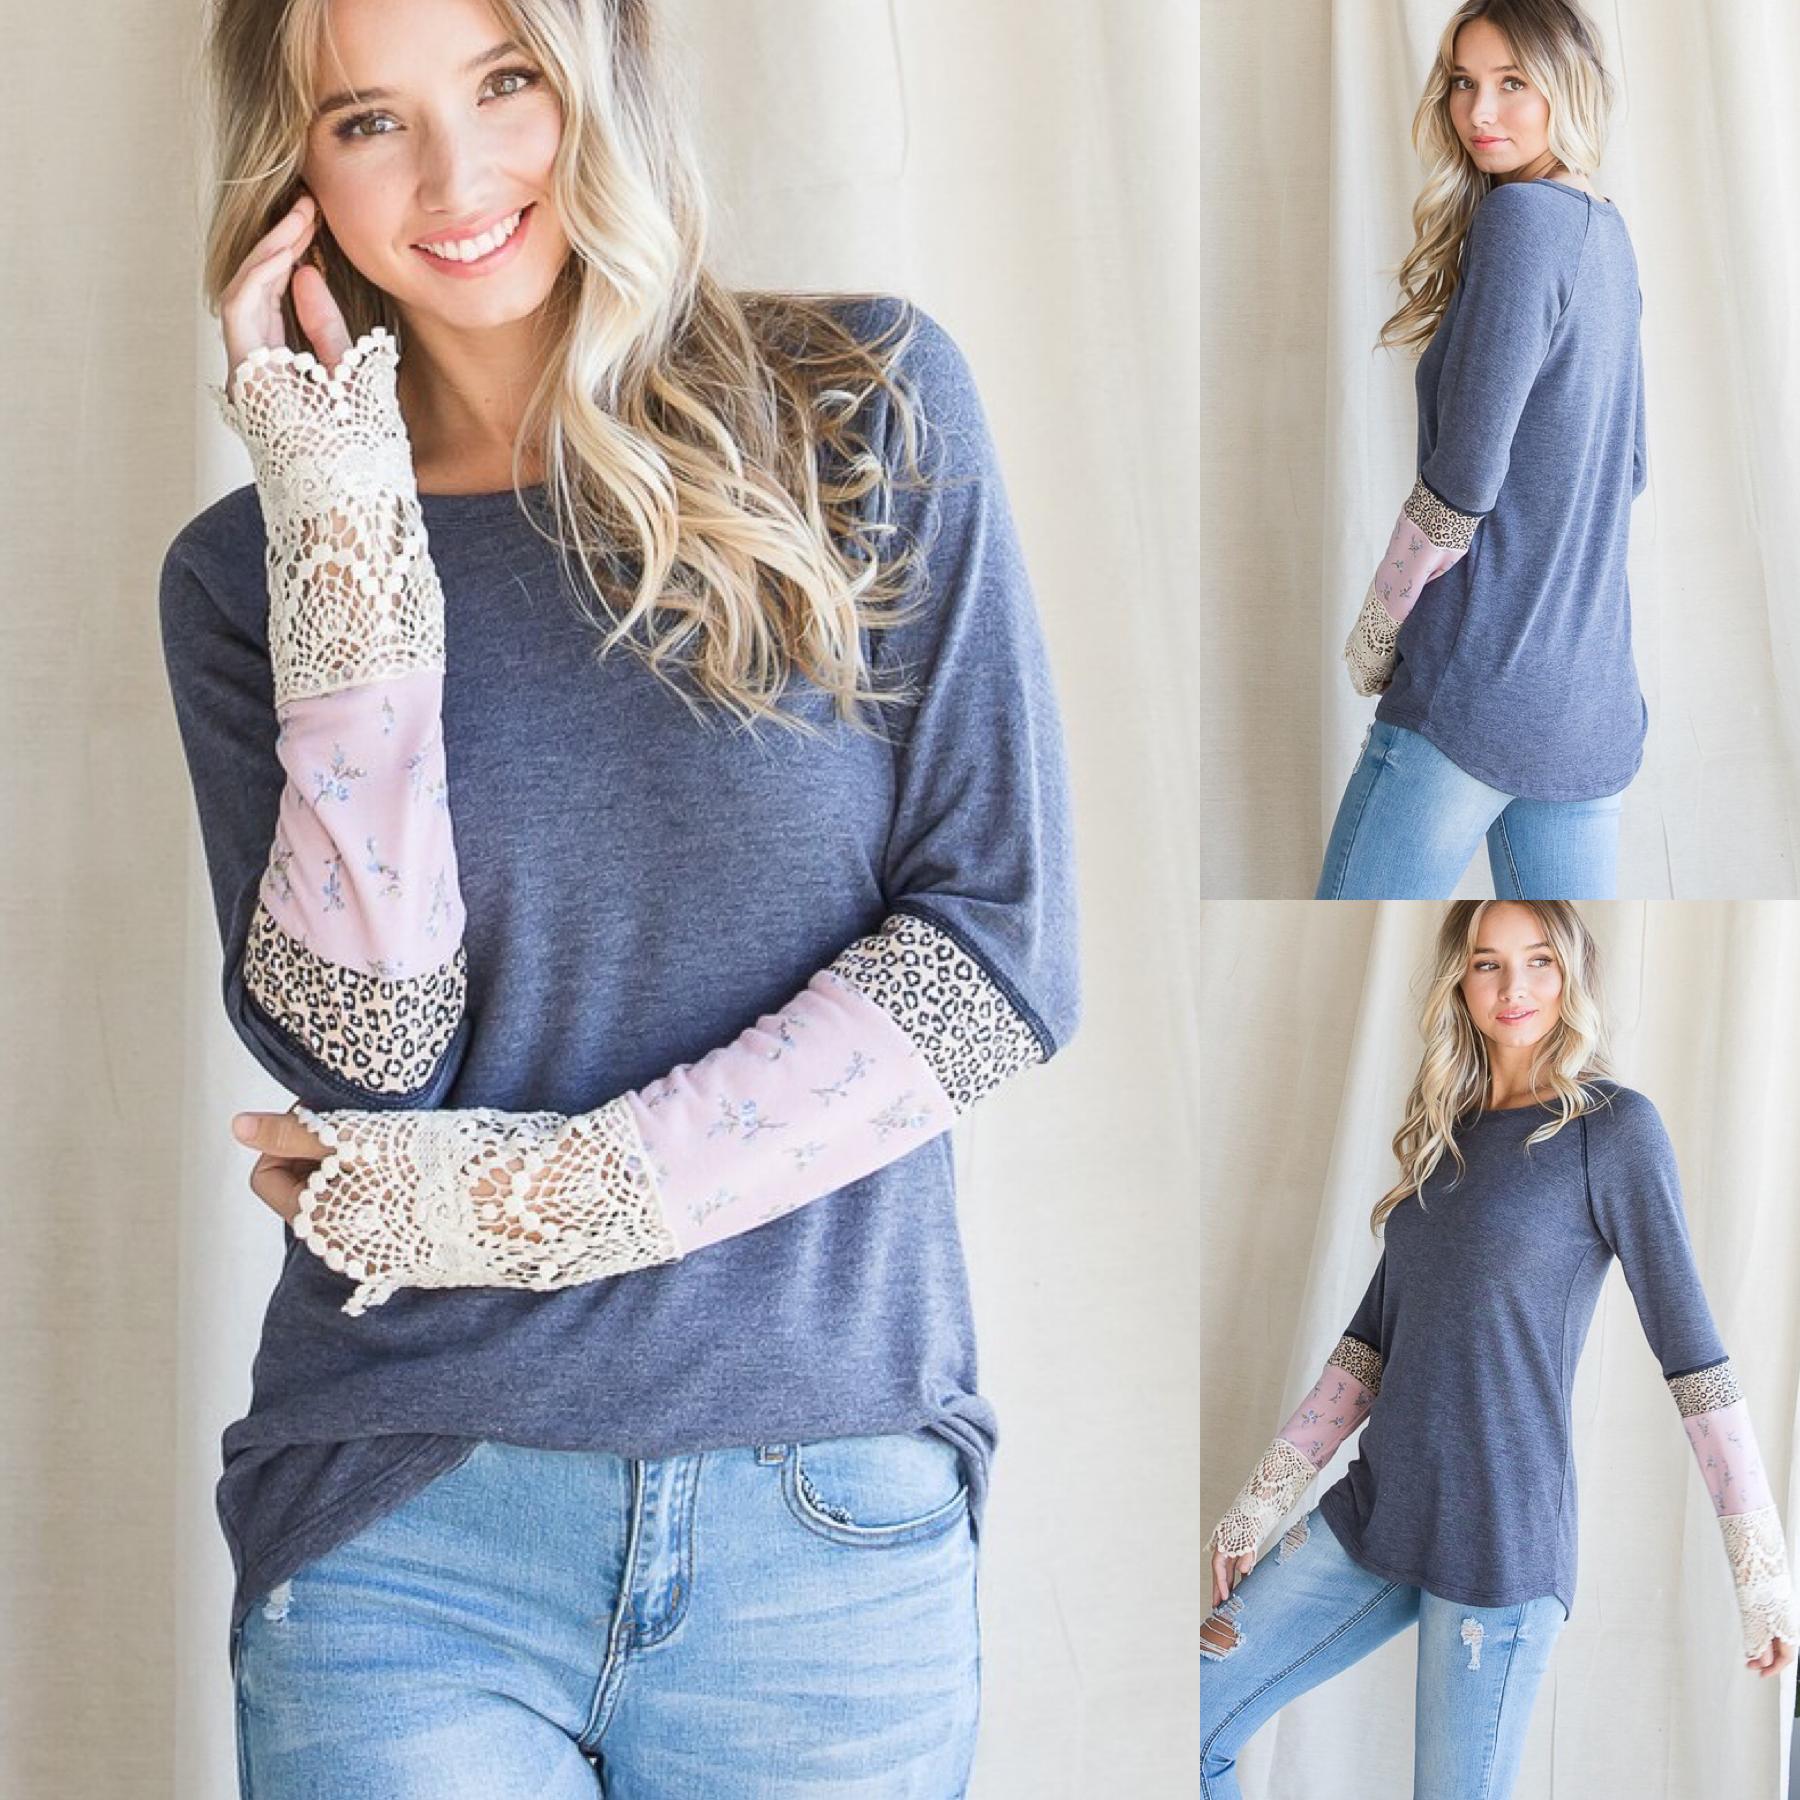 Mixed Fabric Sleeve Top